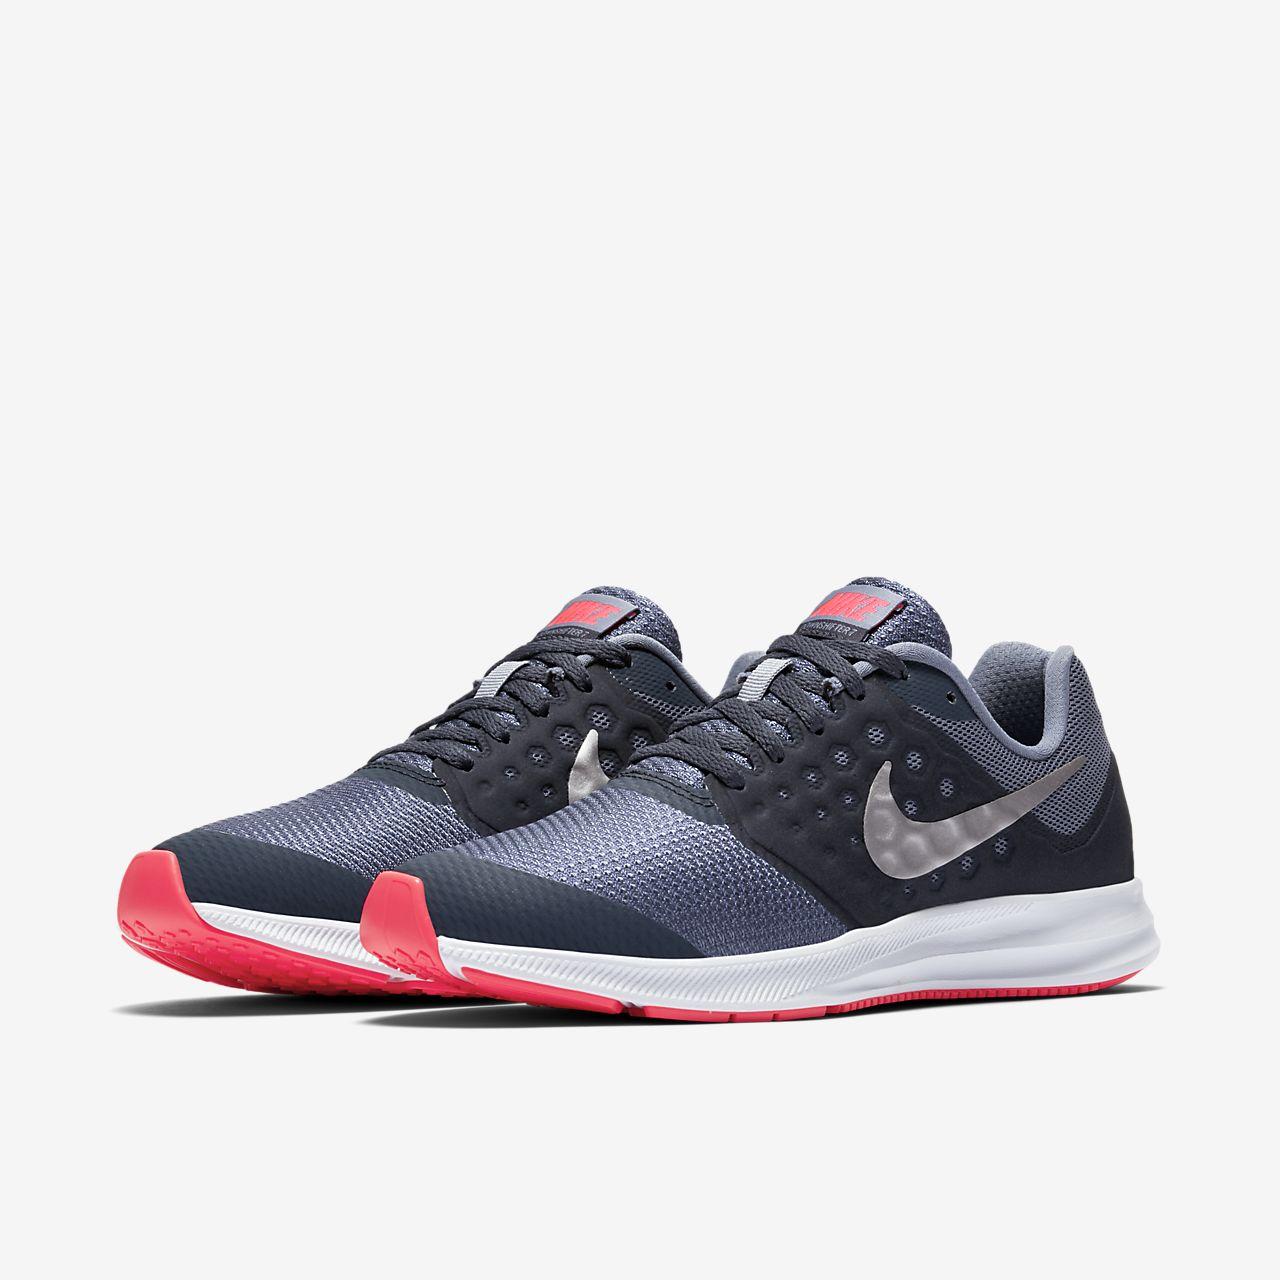 772a136ed54 Nike Downshifter 7 Older Kids  Running Shoe. Nike.com ZA